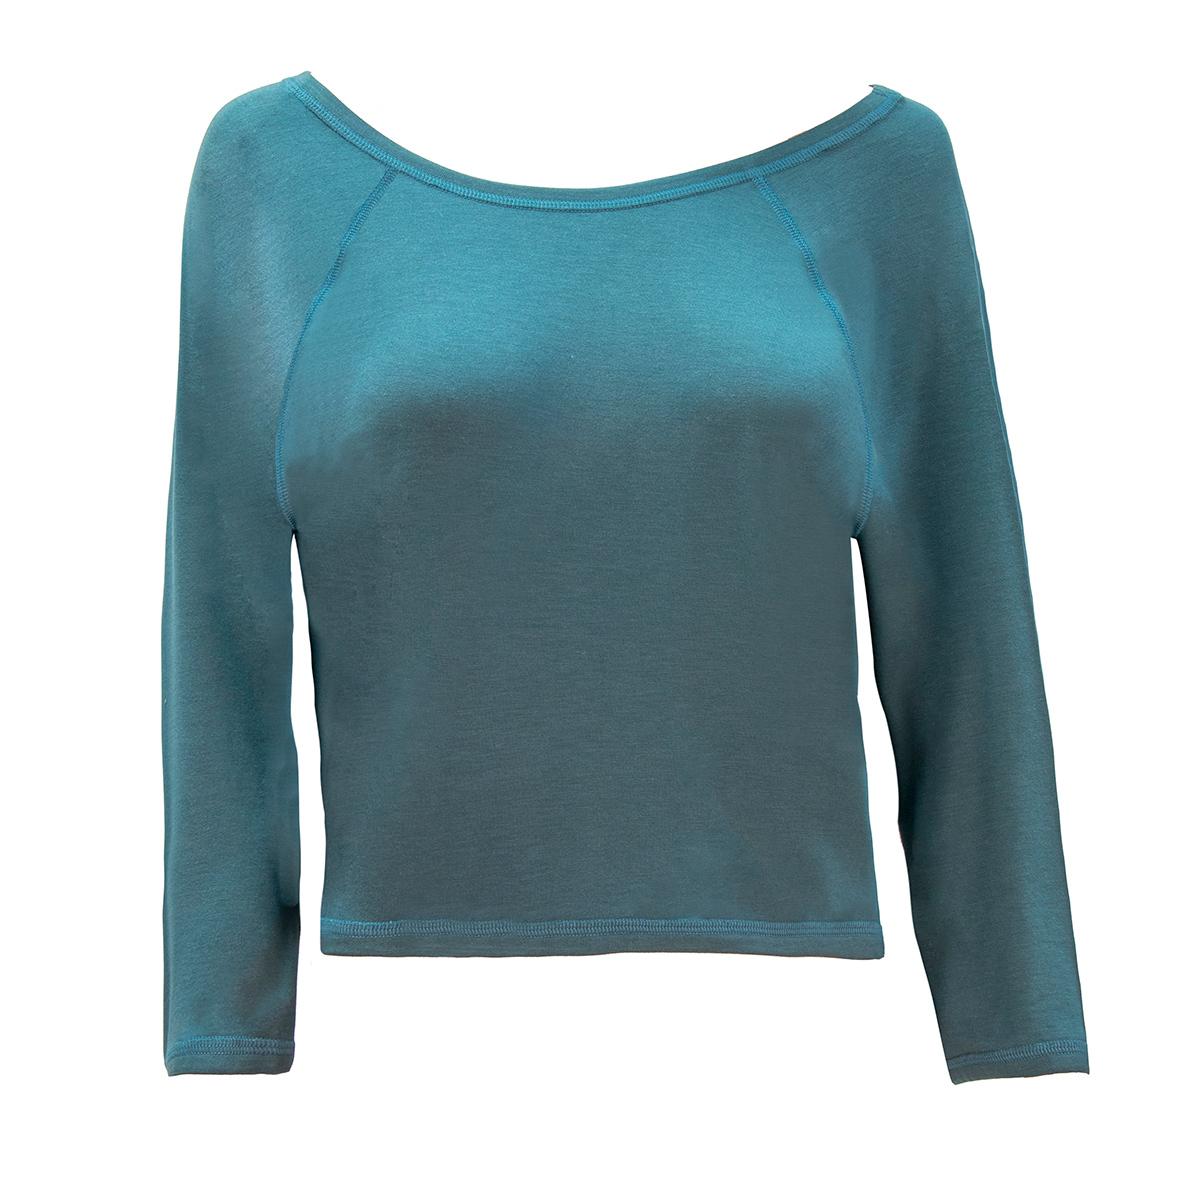 b.well Damen Yoga Kleidung: Raglan Pullover